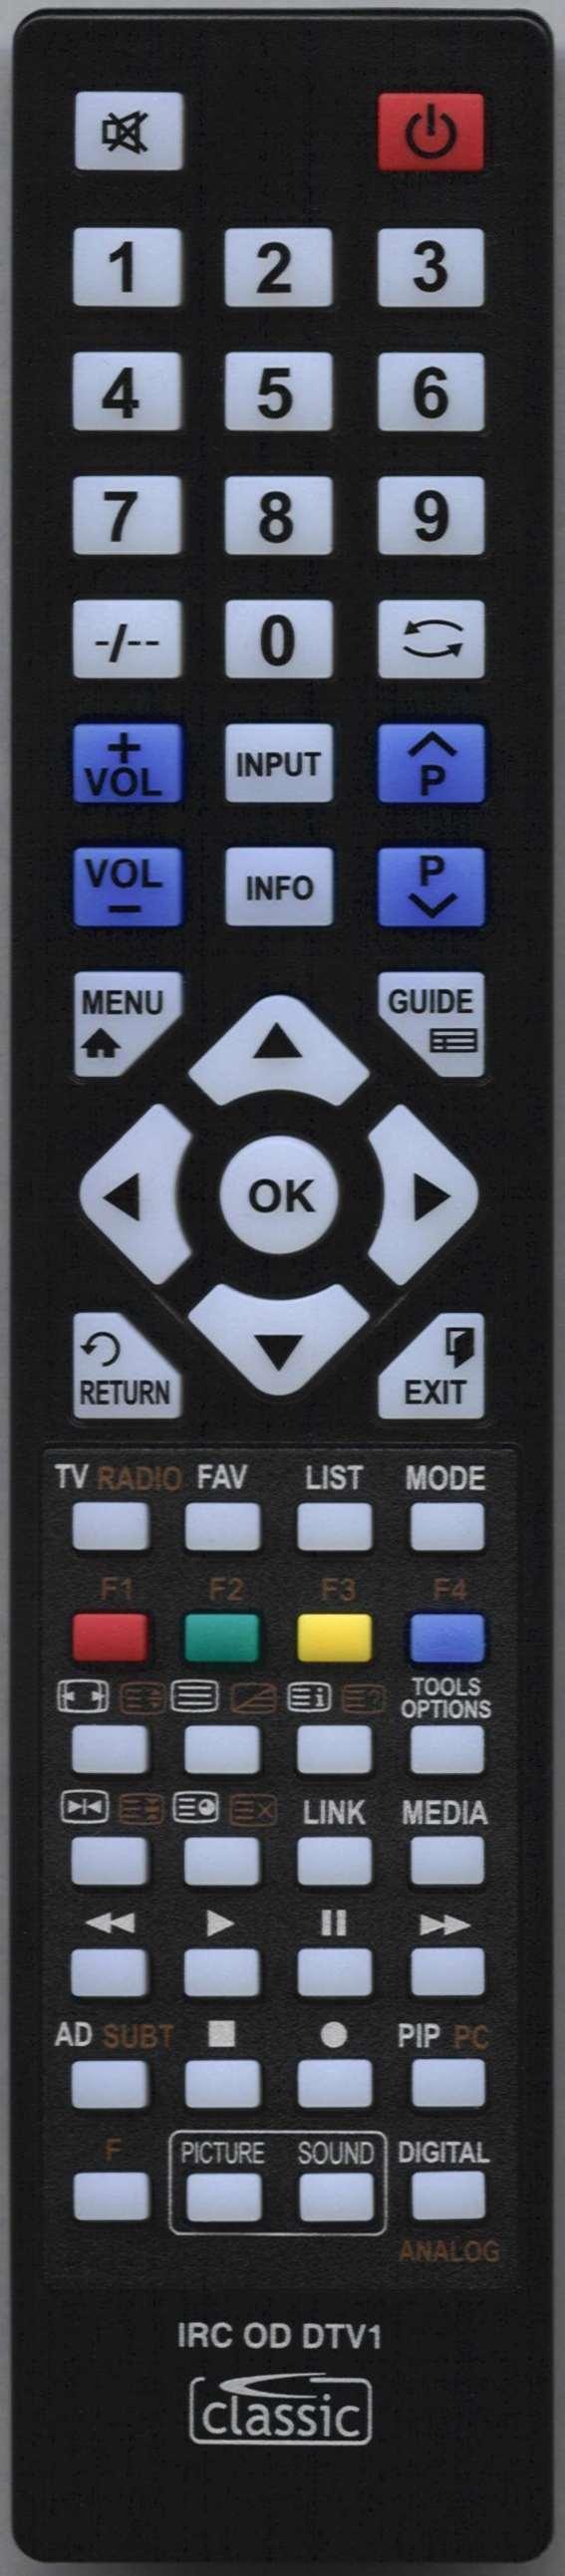 MATSUI M15DVDB19 Remote Control